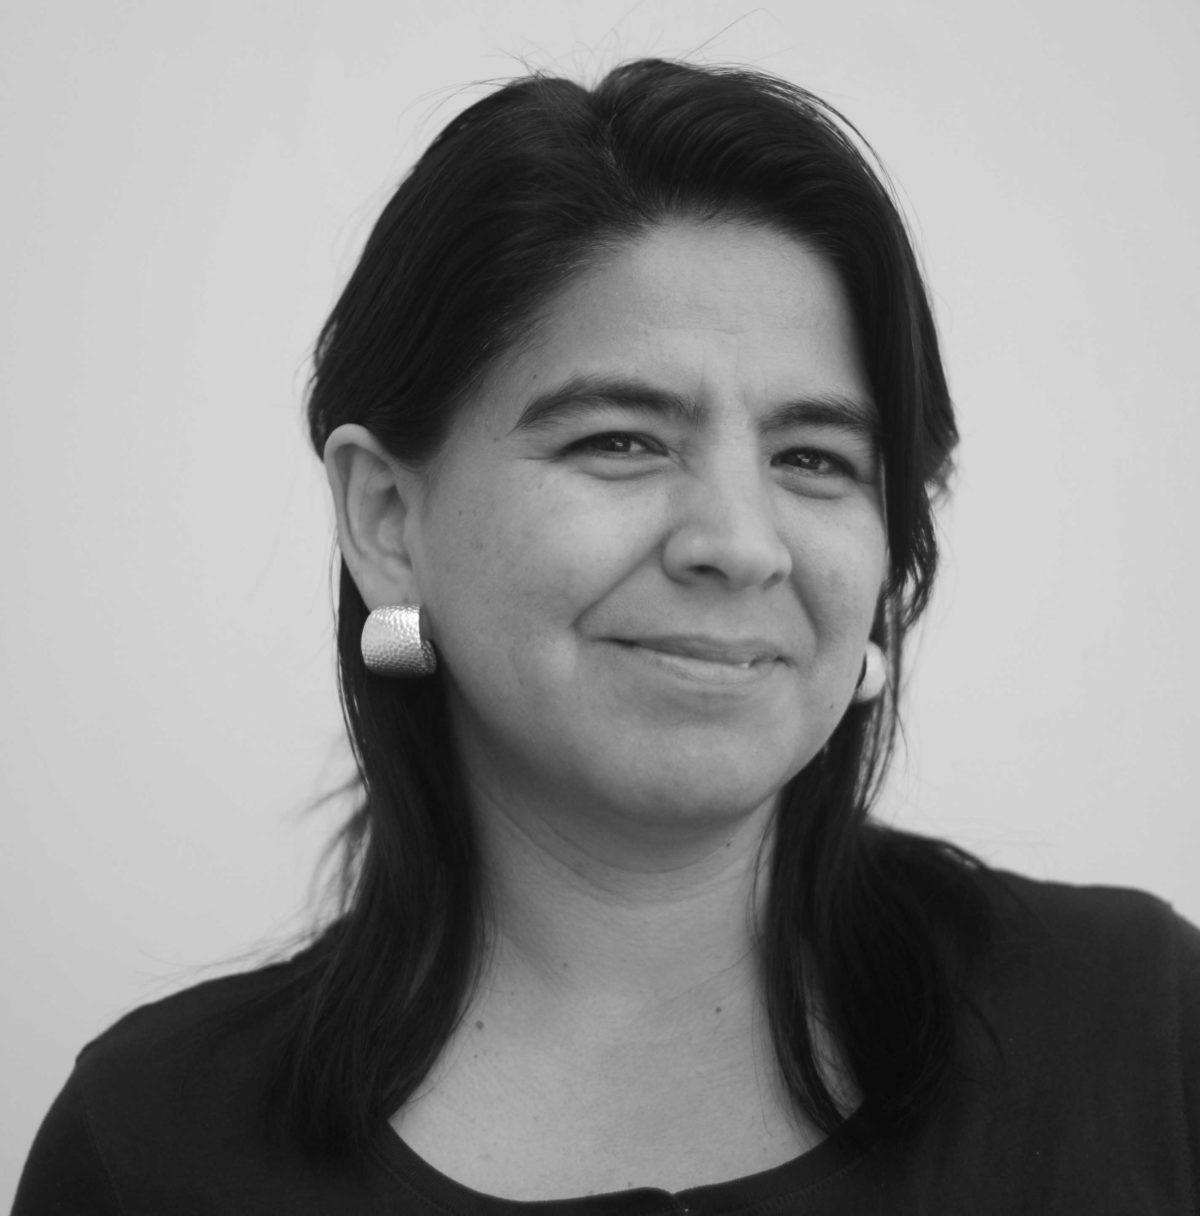 Paola Ugaz